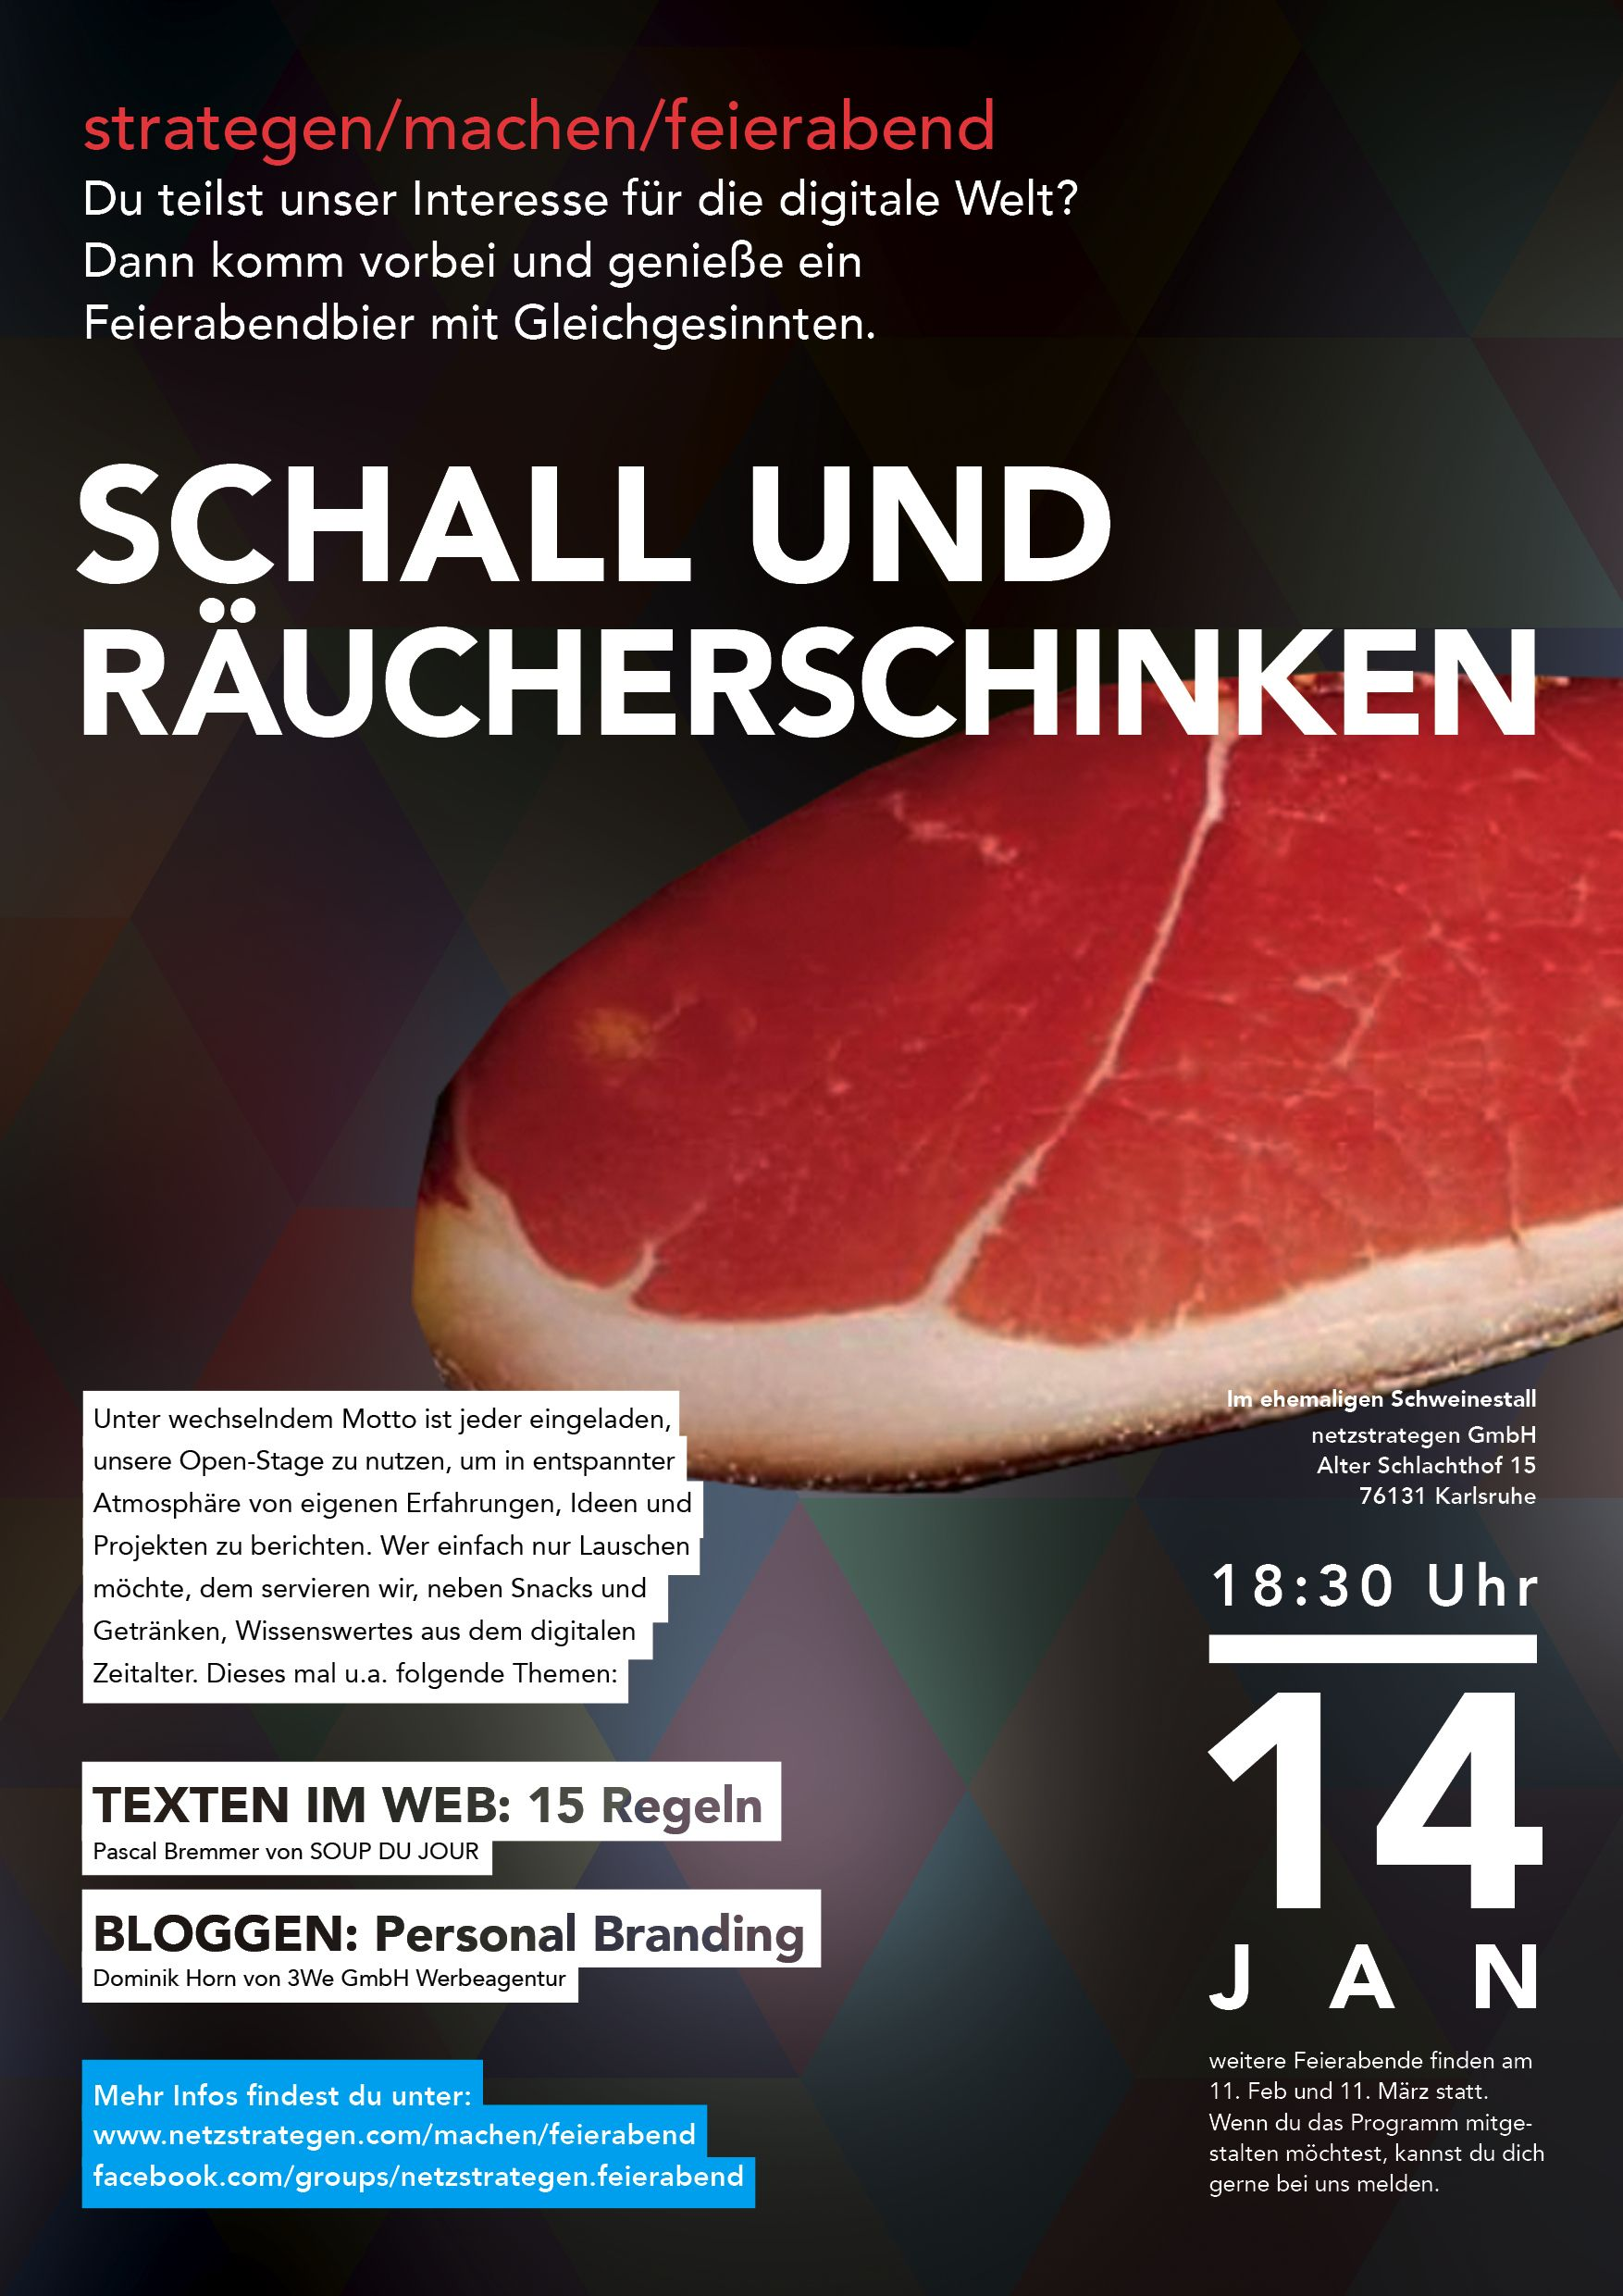 """Schall und Räucherschinken"" - Am 14. Januar 2014 bei uns netzstrategen. Veranstaltungshinweis: https://www.facebook.com/events/508003922631353/"